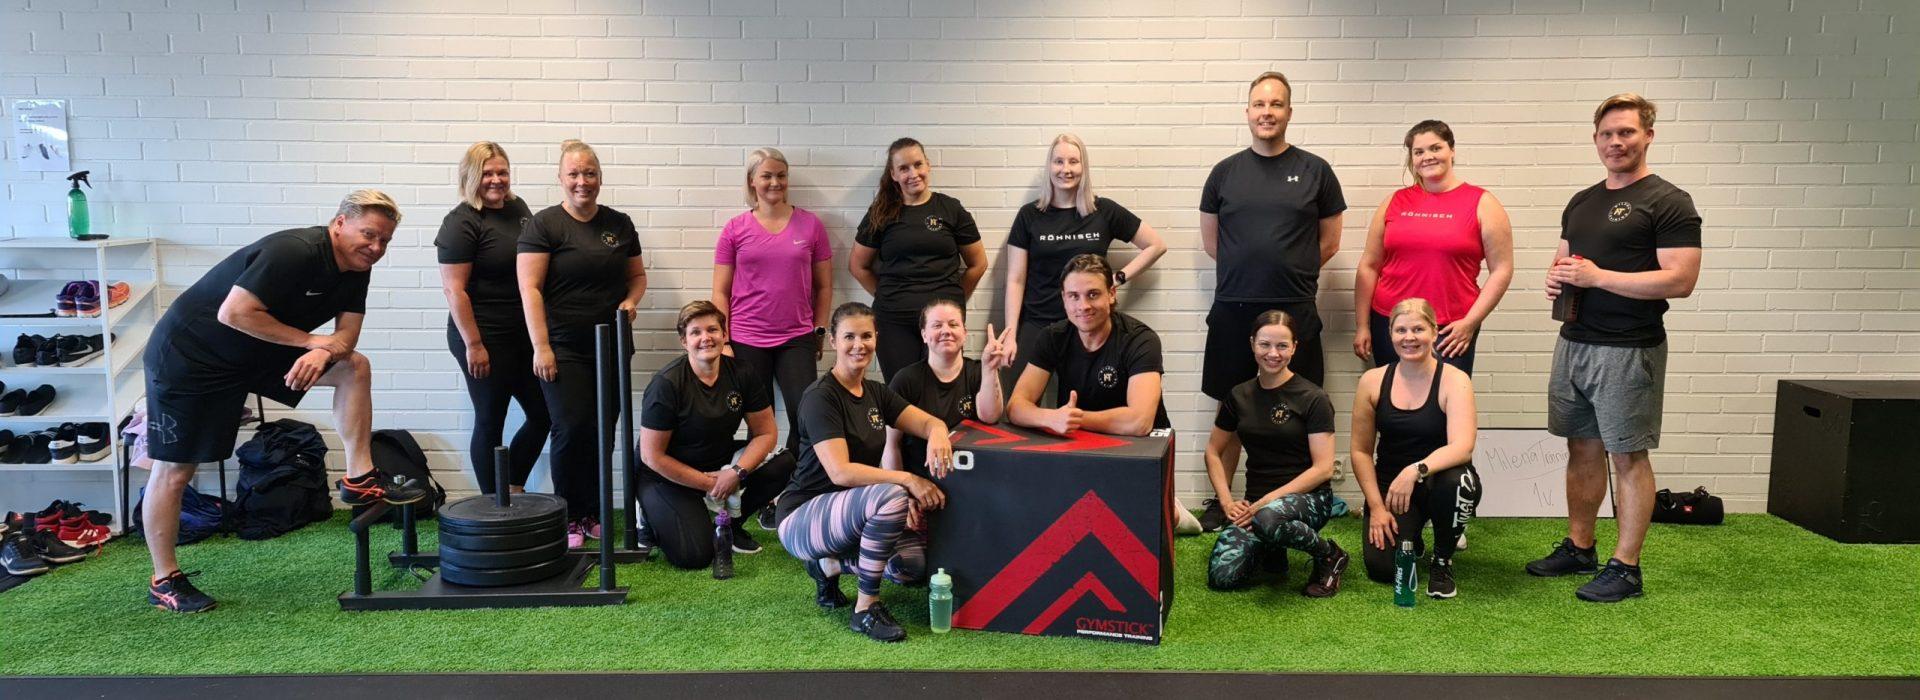 ReeniRyhmä - Pienryhmävalmennusta Tampereella   MT-Center